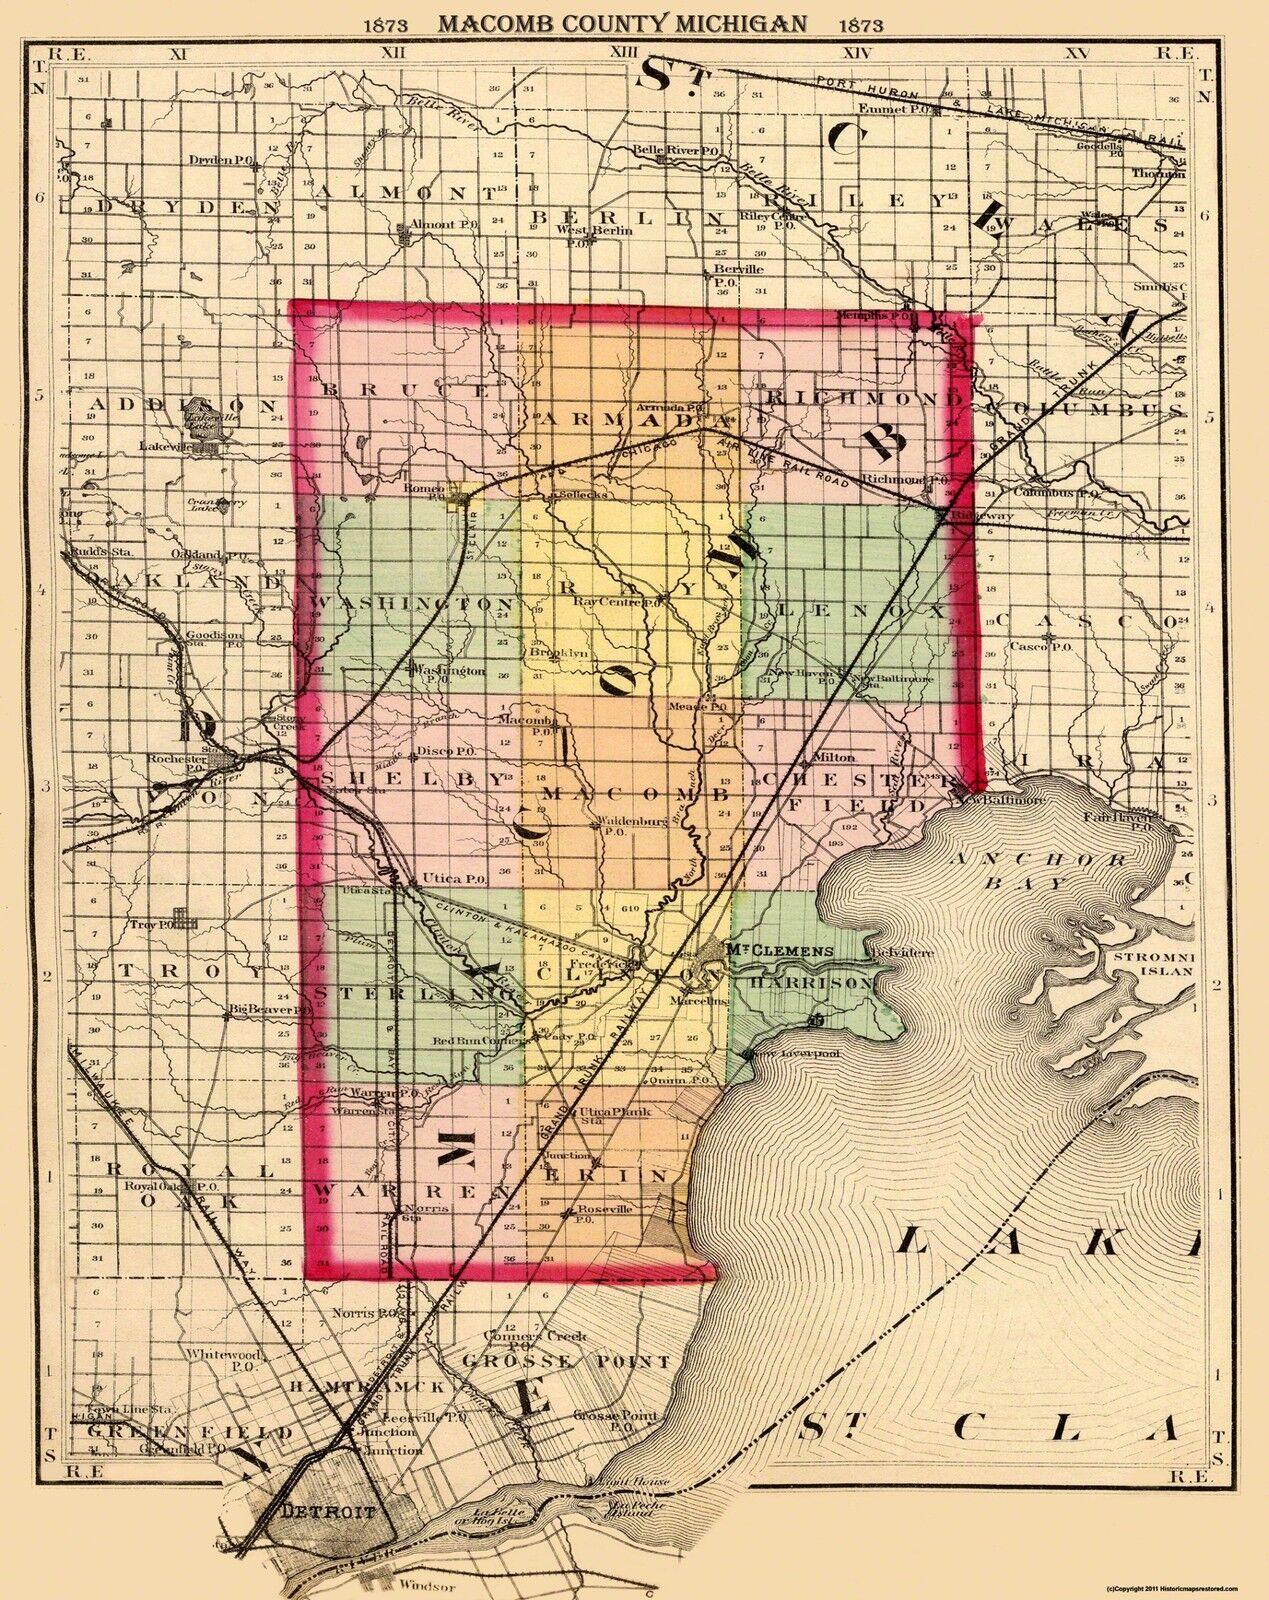 Old County Map - Macomb Michigan - 1873 - 23 x 29 | eBay